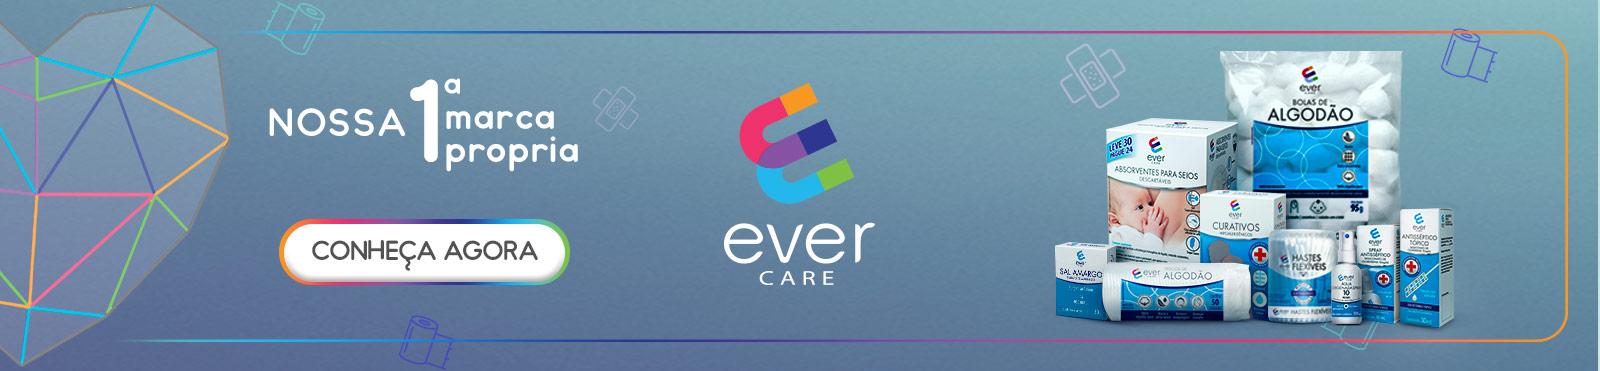 ever-care